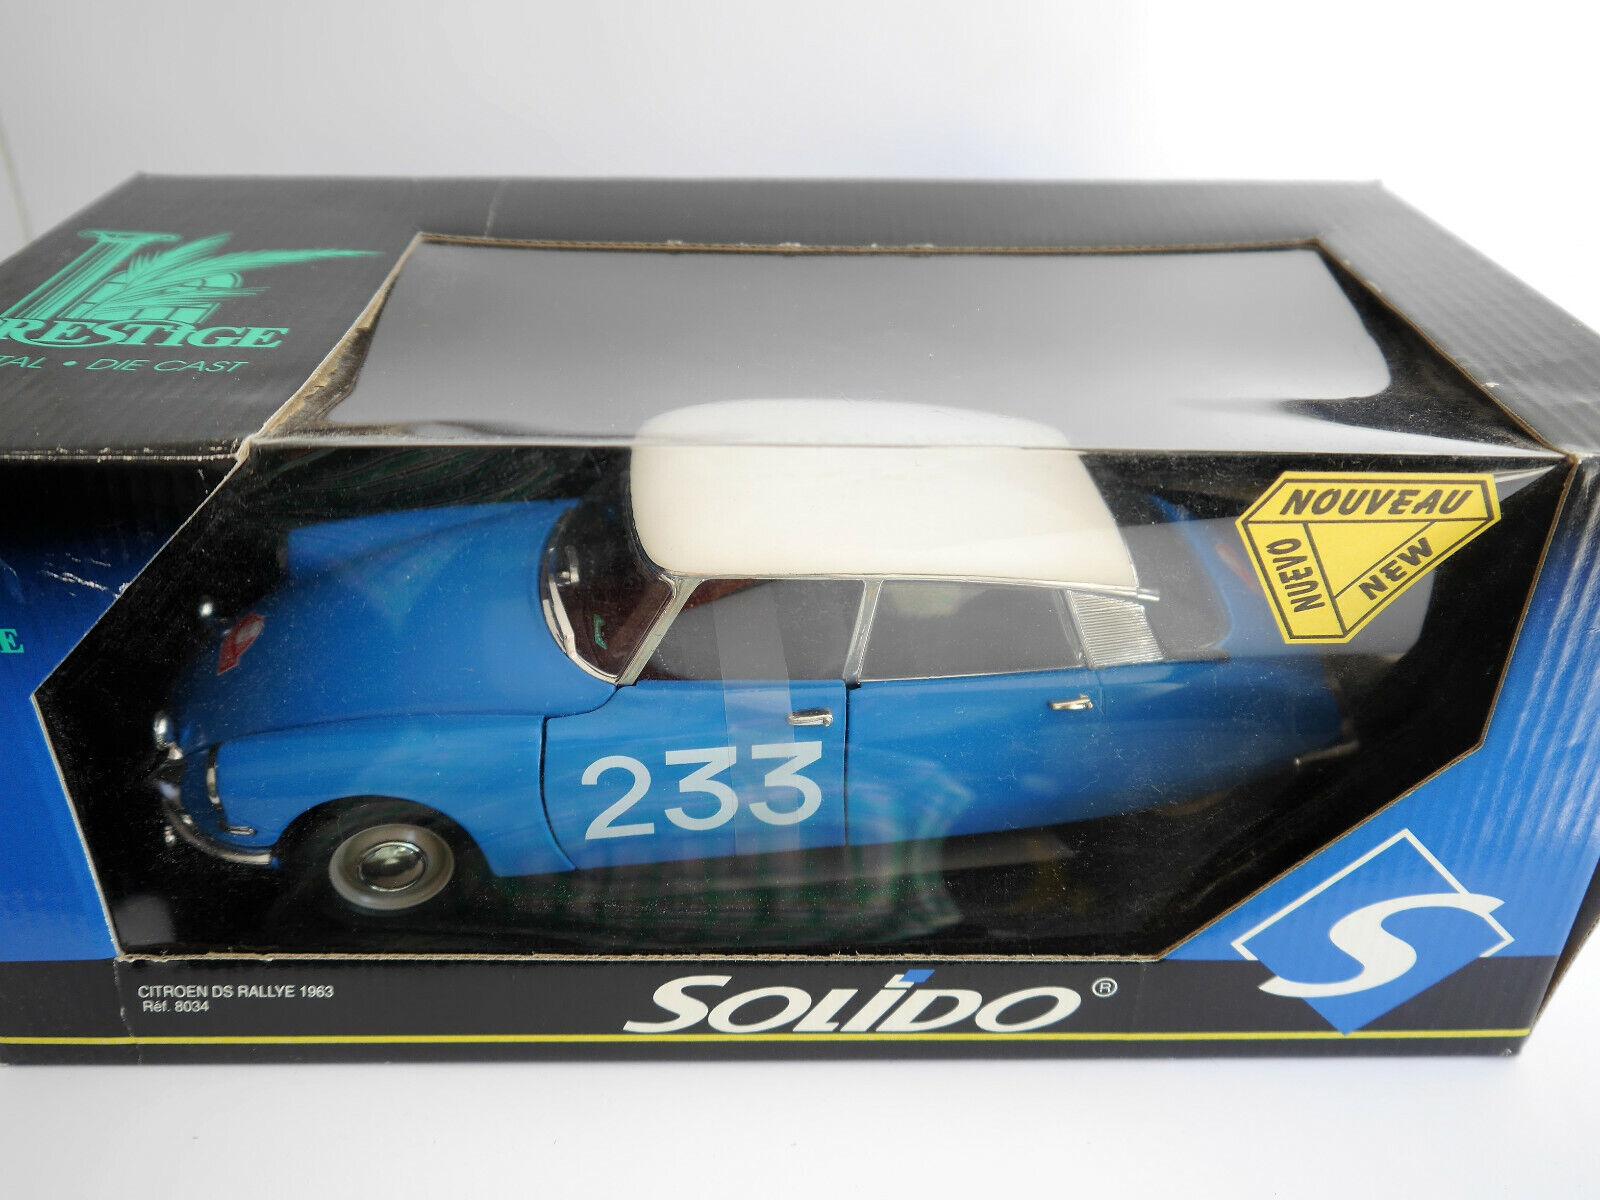 CITROEN DS RALLYE RALLY RAID Monte Carlo 1963  233, SOLIDO  8034 en 1 18 en boîte